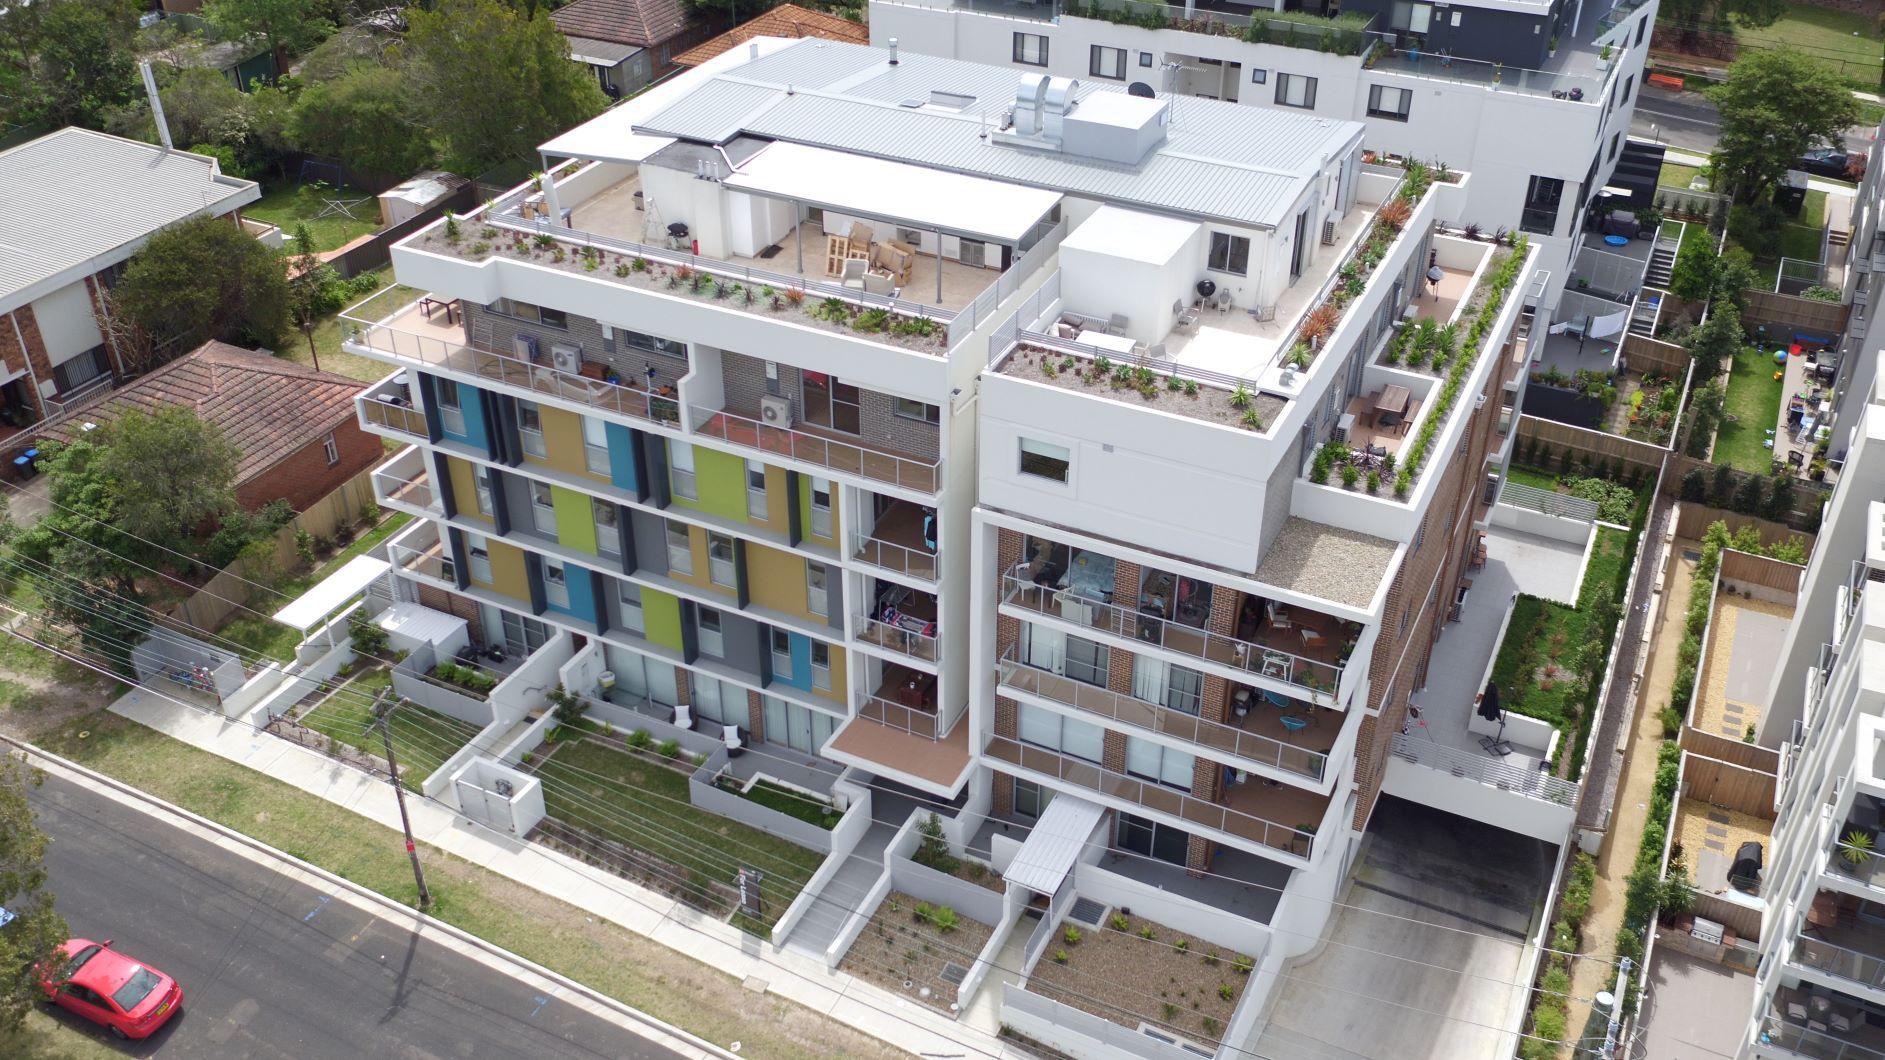 Lane Cove High End Construction Facade Terrace Homes Landscaping